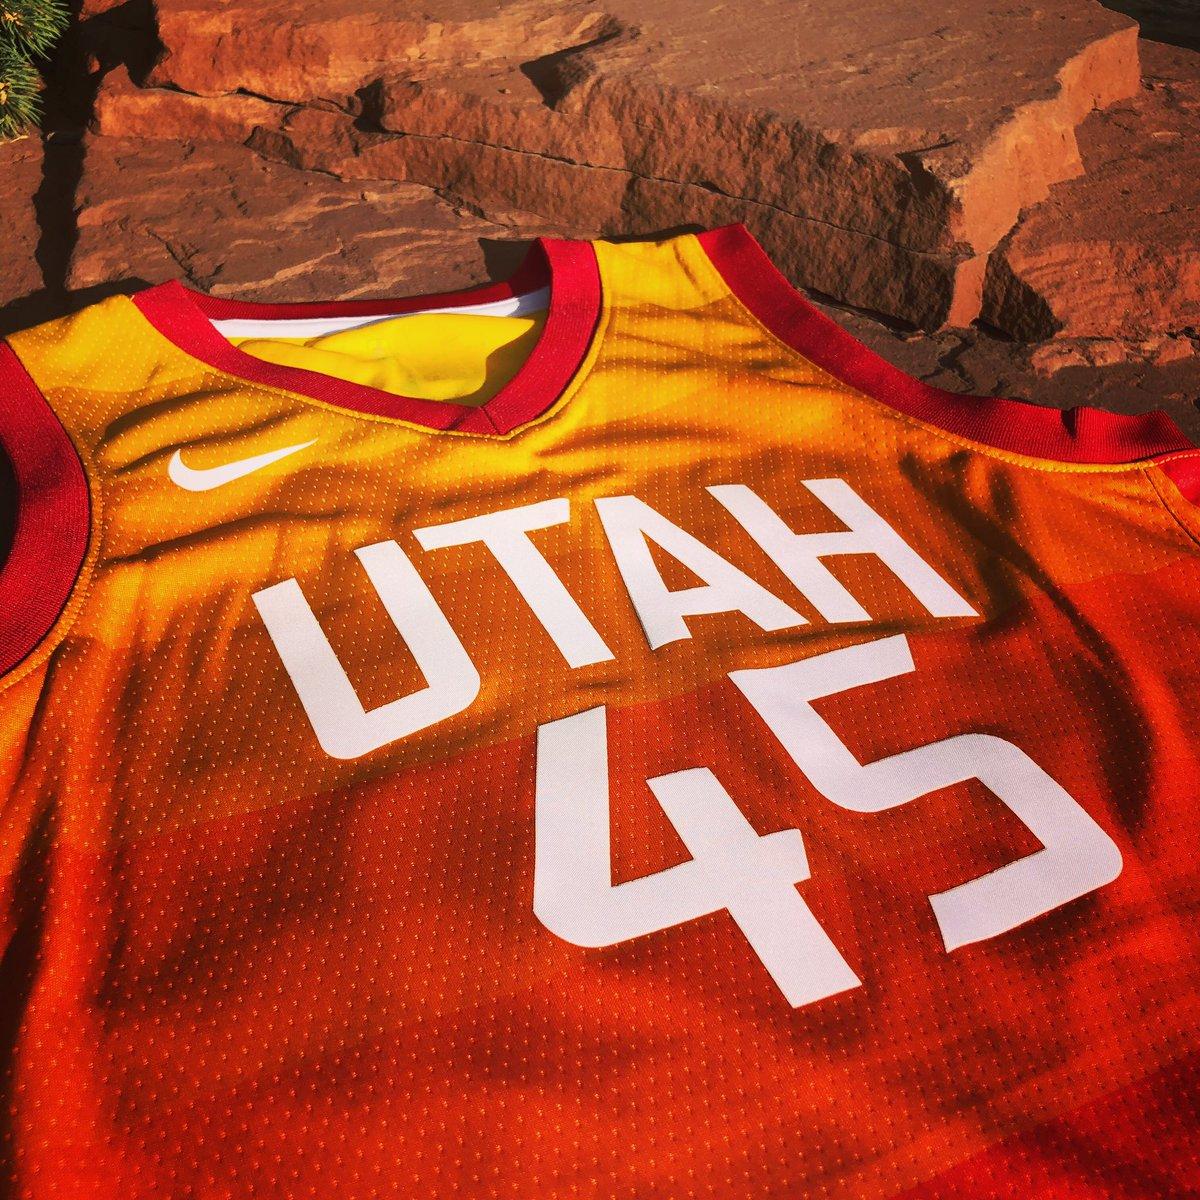 brand new 3c318 d1c06 Utah Jazz Team Store on Twitter: